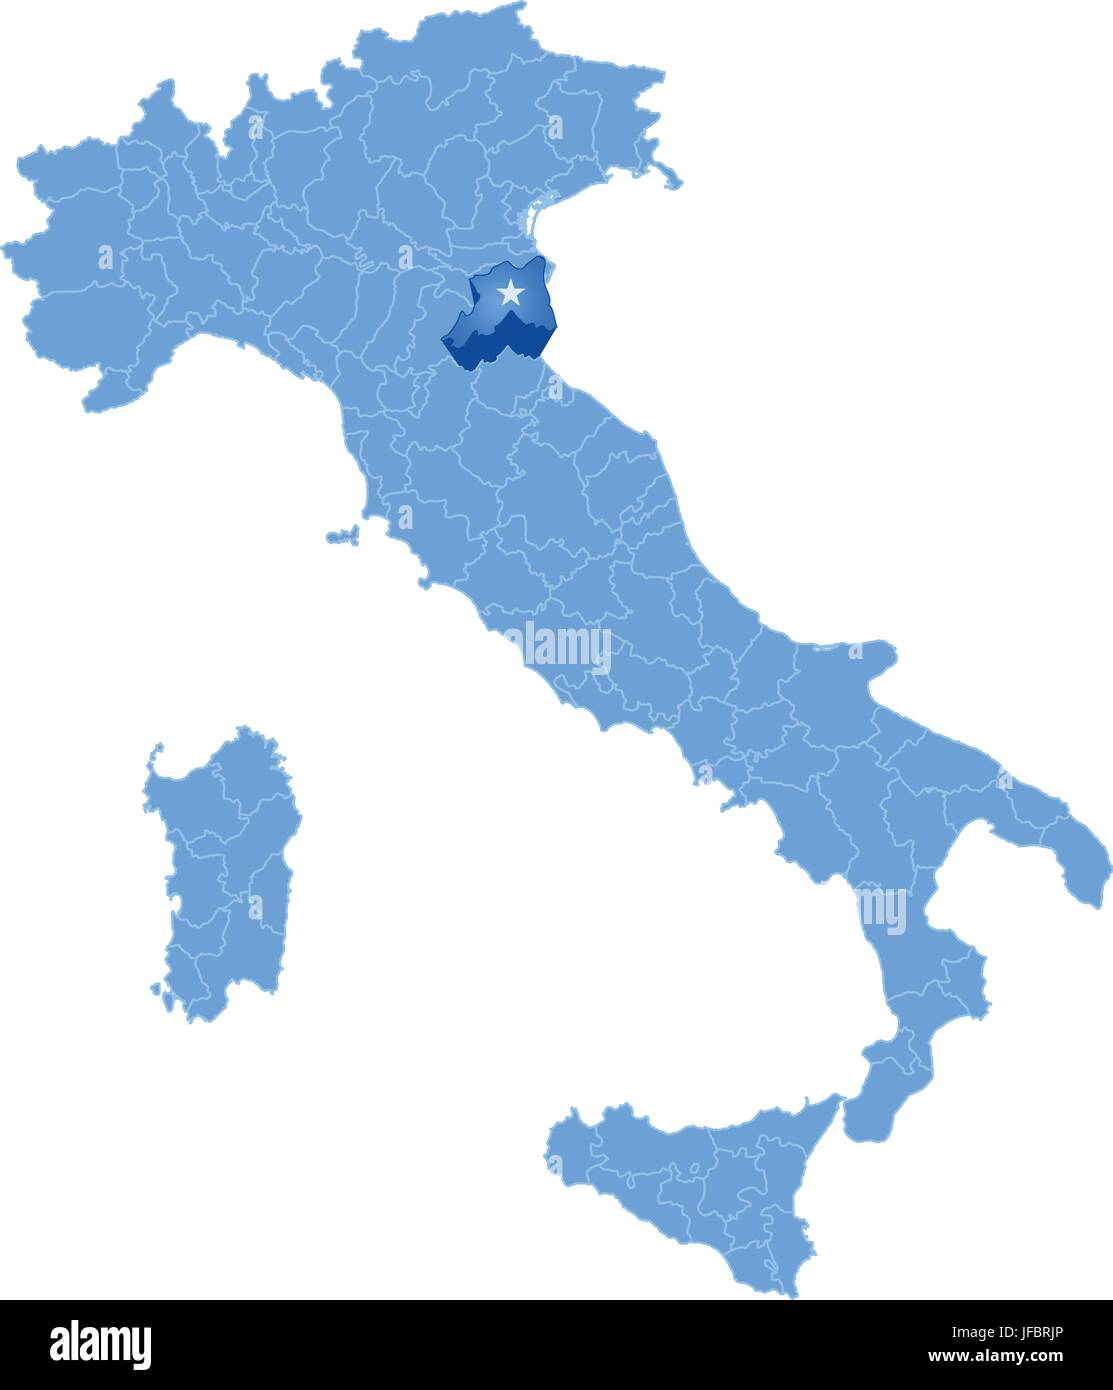 Map of Italy Ravenna Stock Vector Art Illustration Vector Image